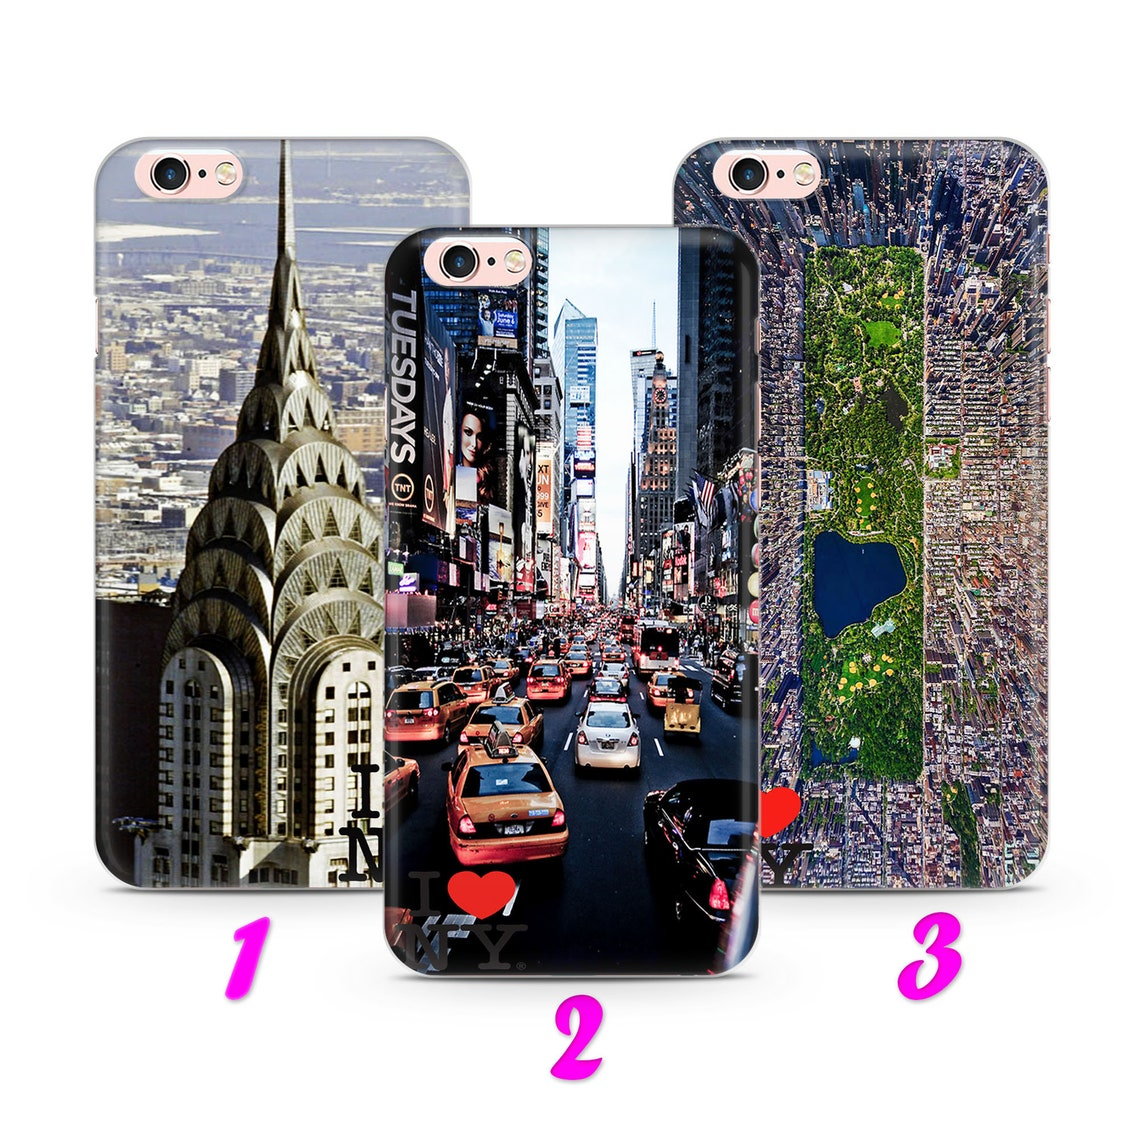 I LoVE NeW YoRK 3 iPhone 4 5 SE 1 & 2 Gen 6 7 8 X s Max ...